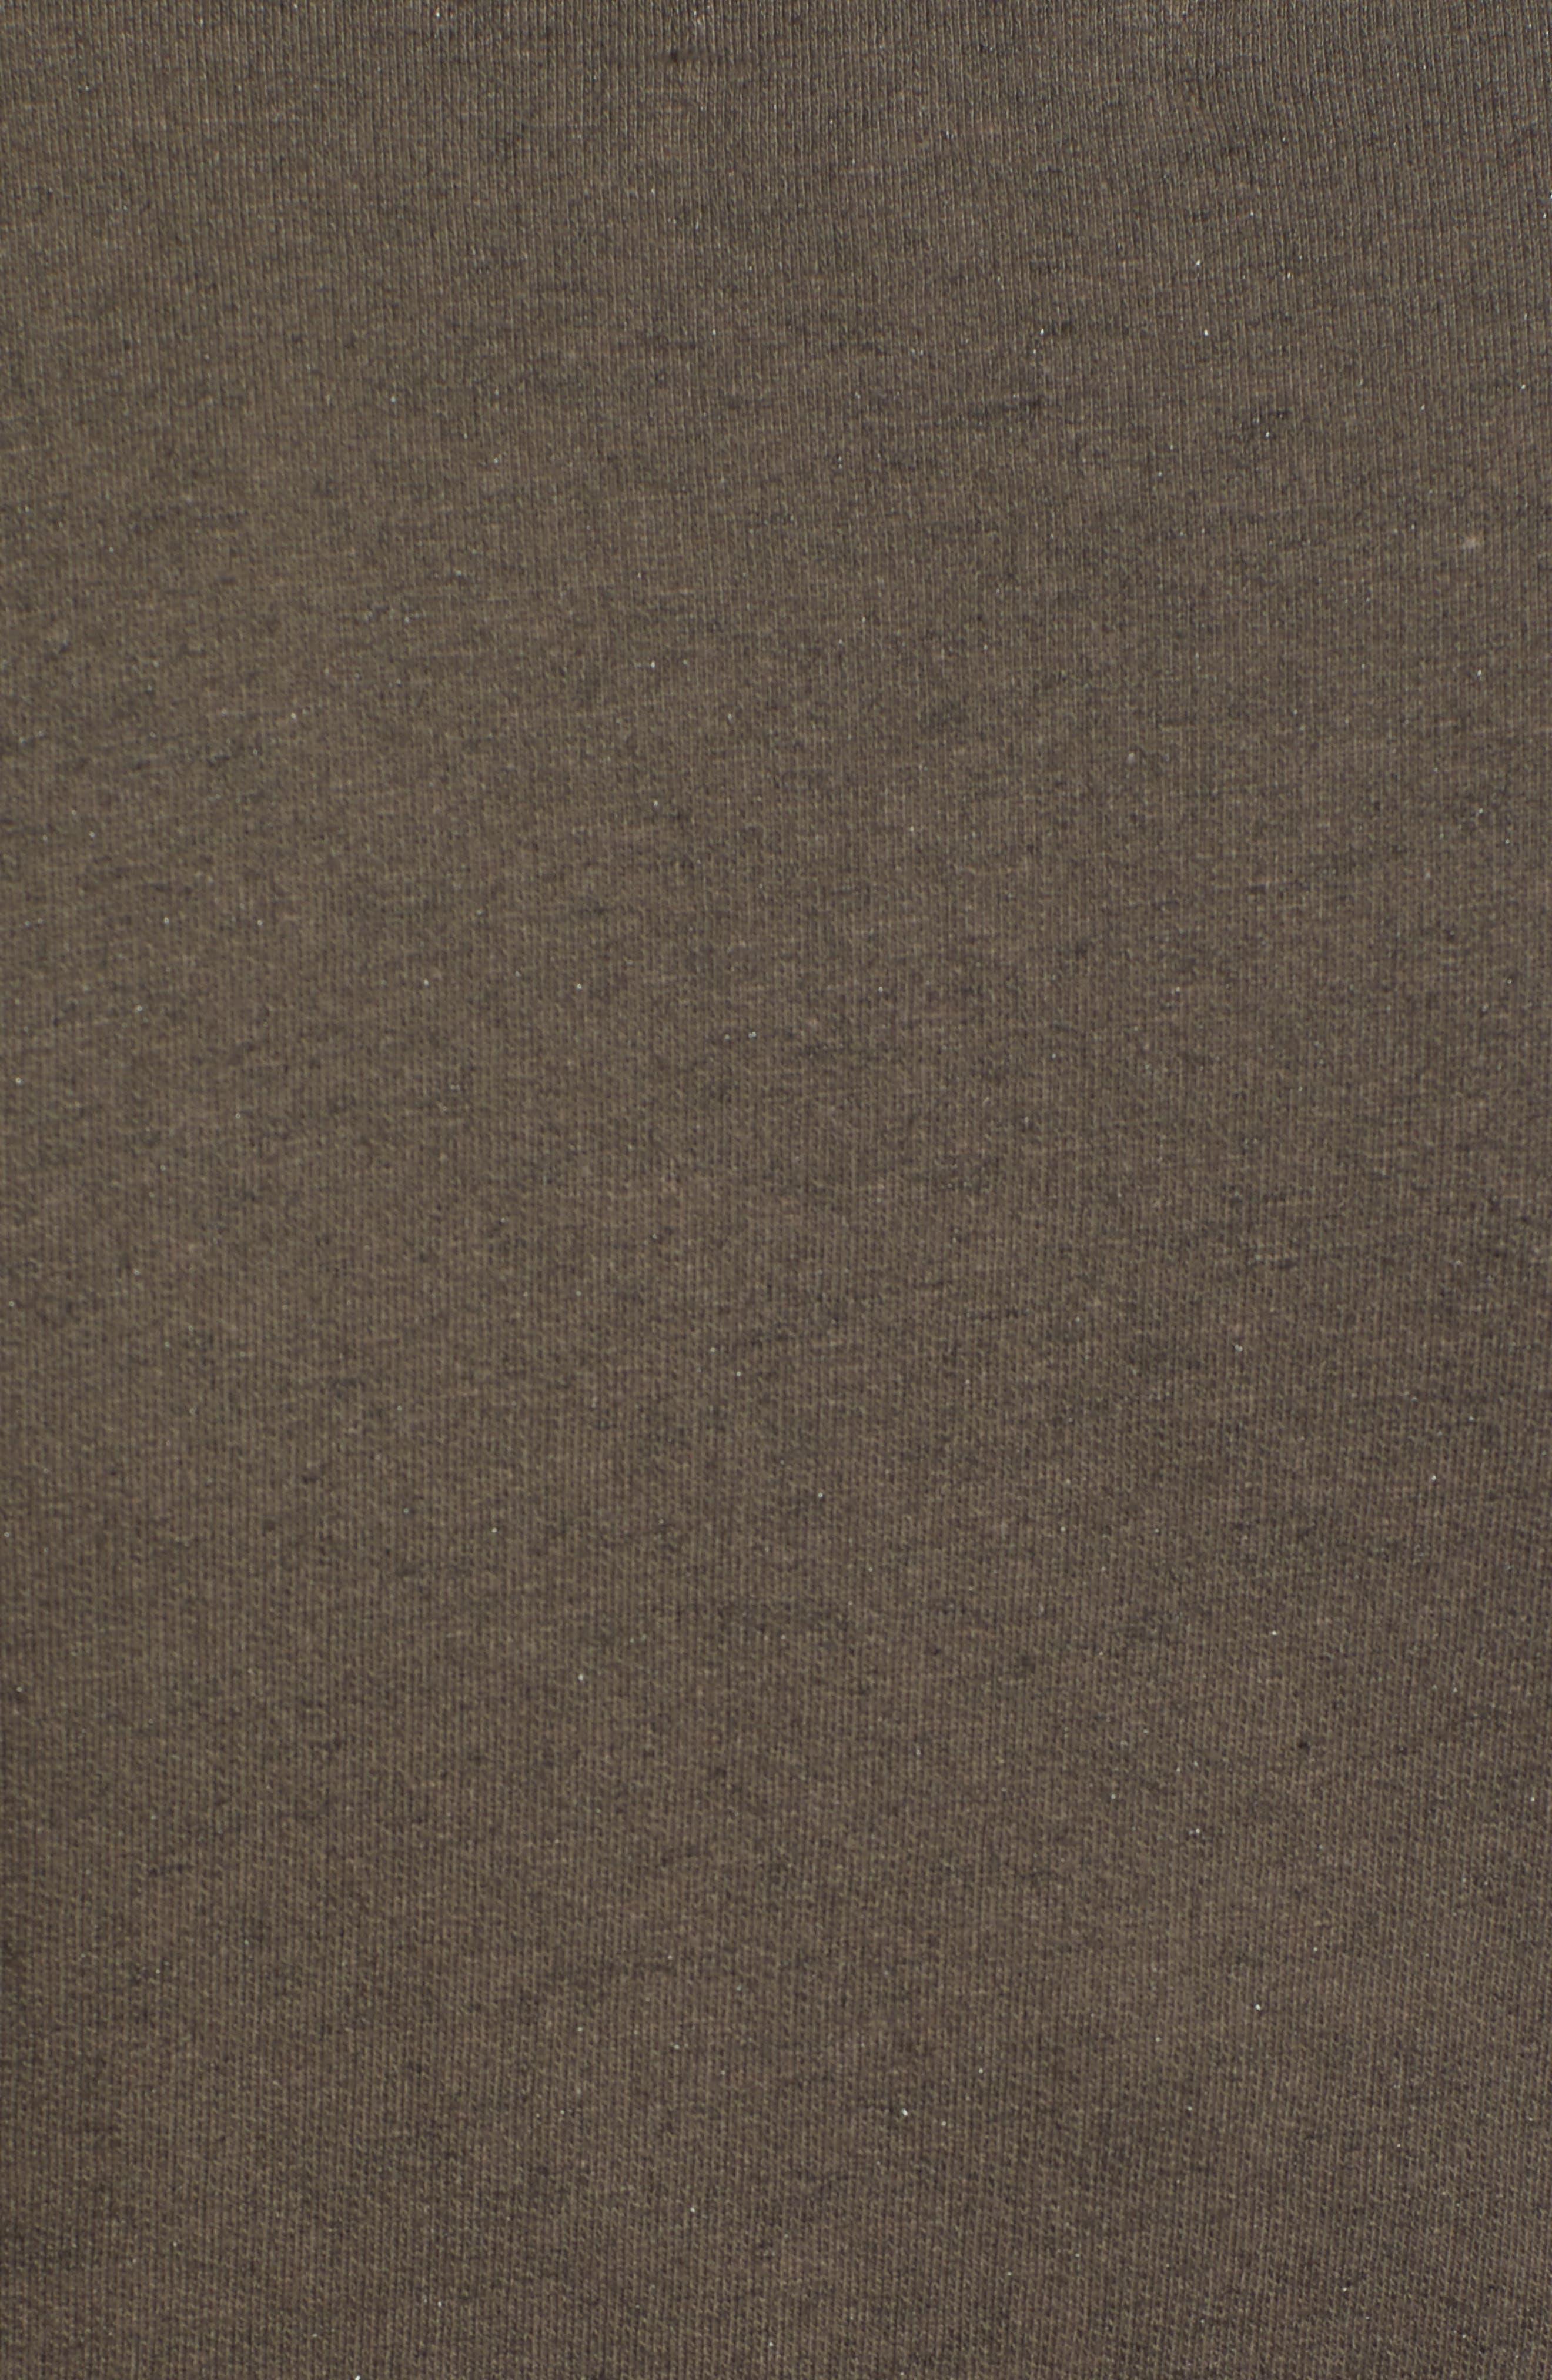 Stella Knit Jacket,                             Alternate thumbnail 54, color,